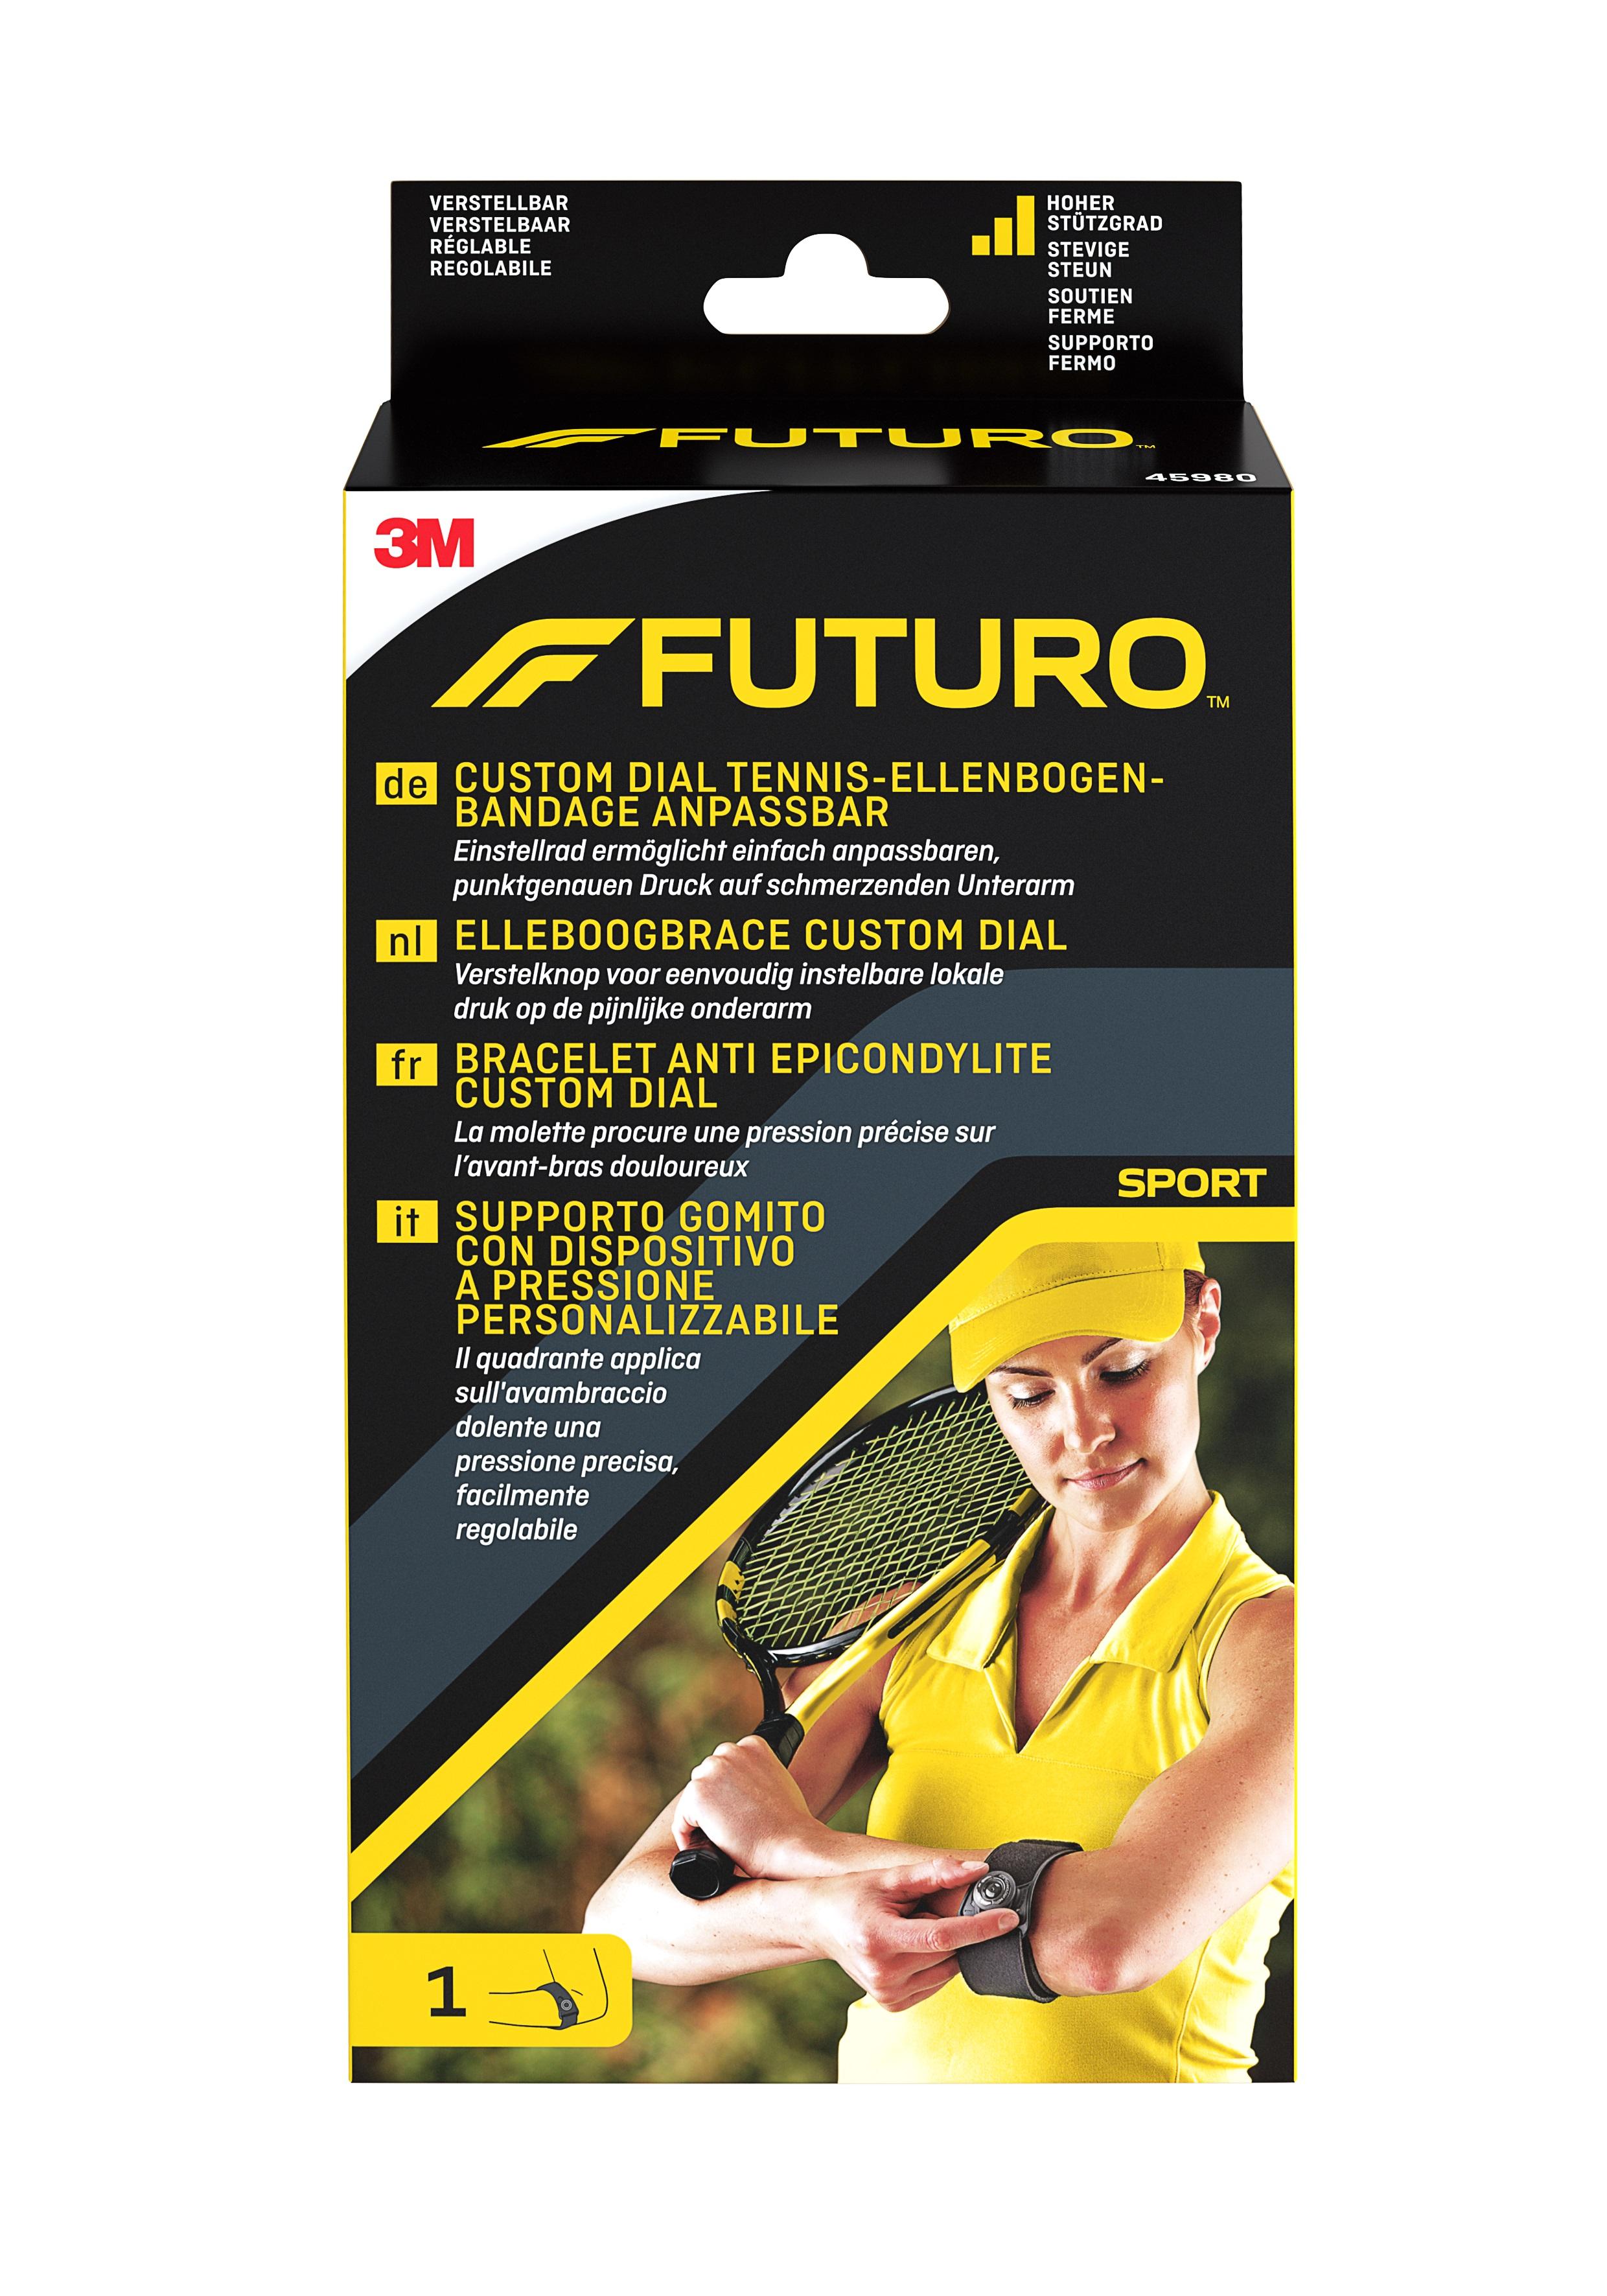 FUTURO™ Custom Dial Tennis-Ellenbogen-Bandage anpassbar